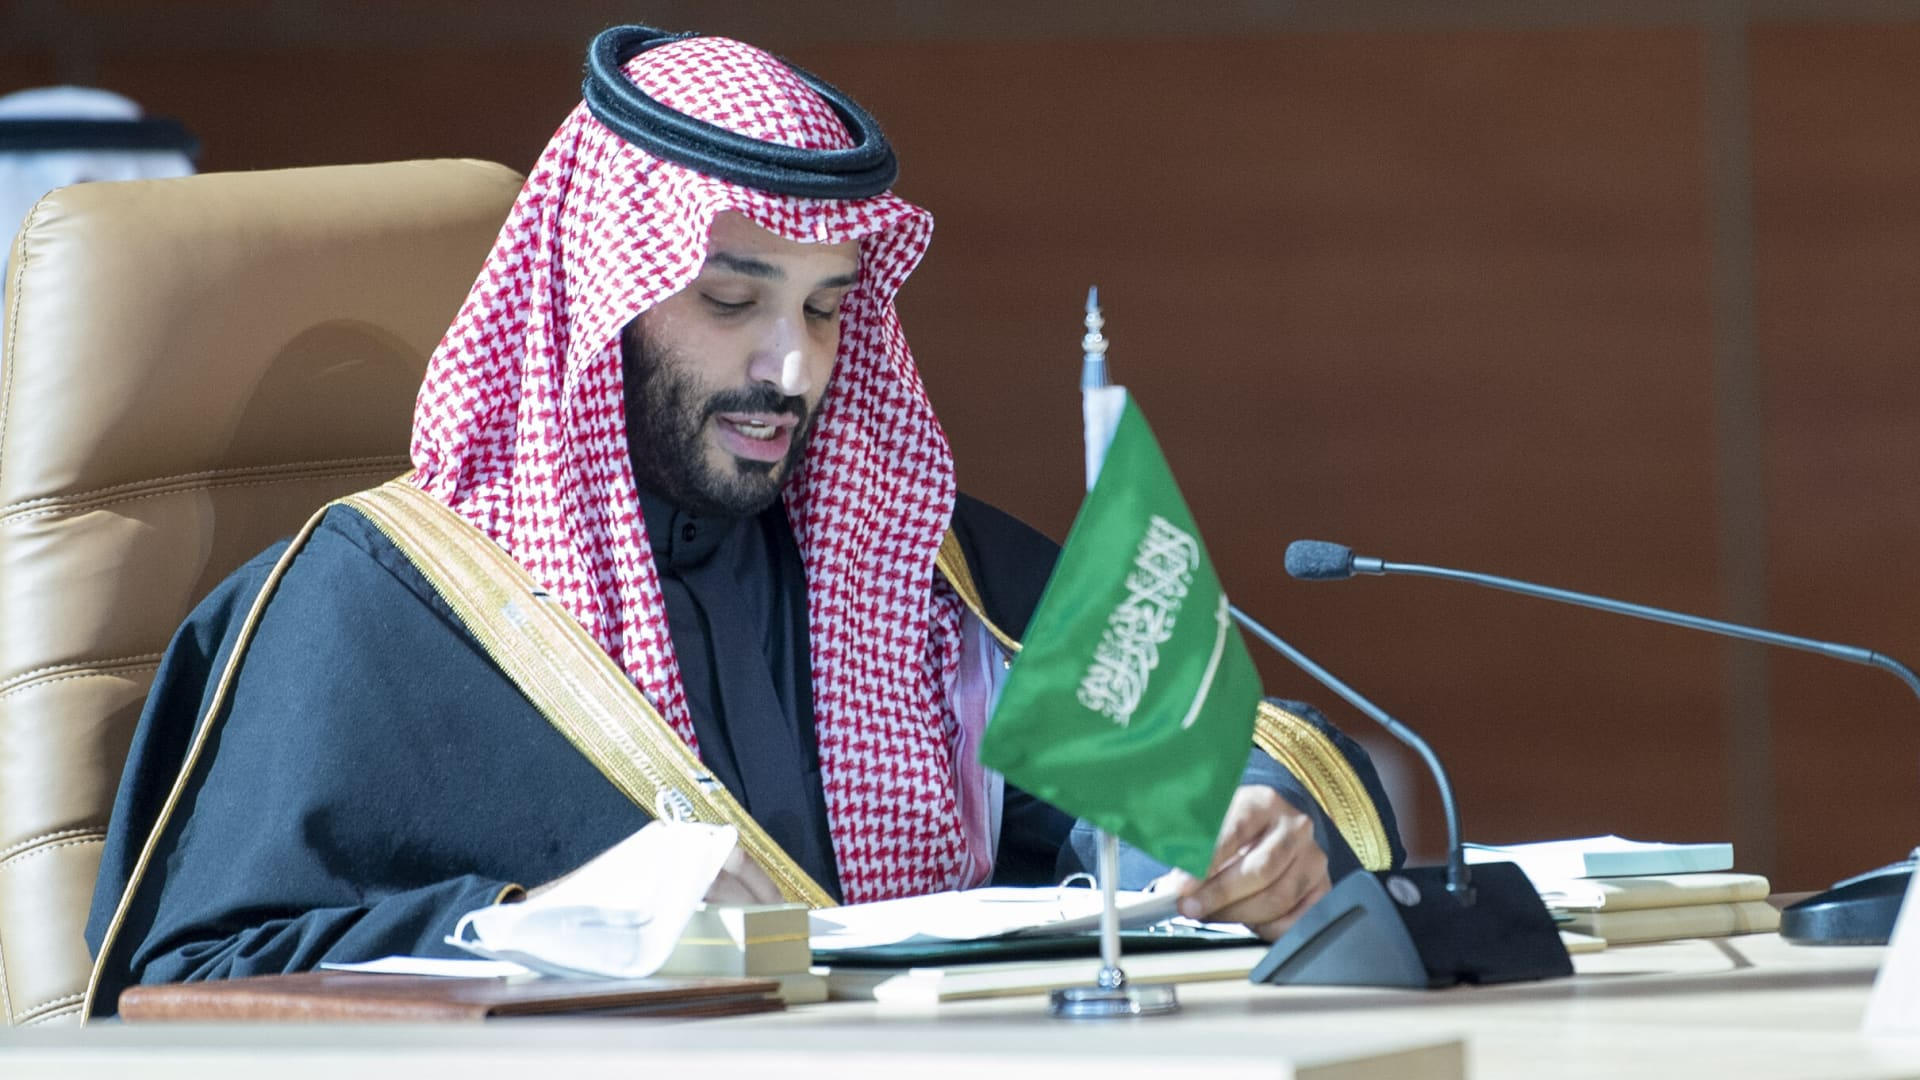 Crown Prince of Saudi Arabia Mohammed bin Salman attends the 41st Summit of Gulf Cooperation Council in Al-Ula, Saudi Arabia on January 05, 2021.